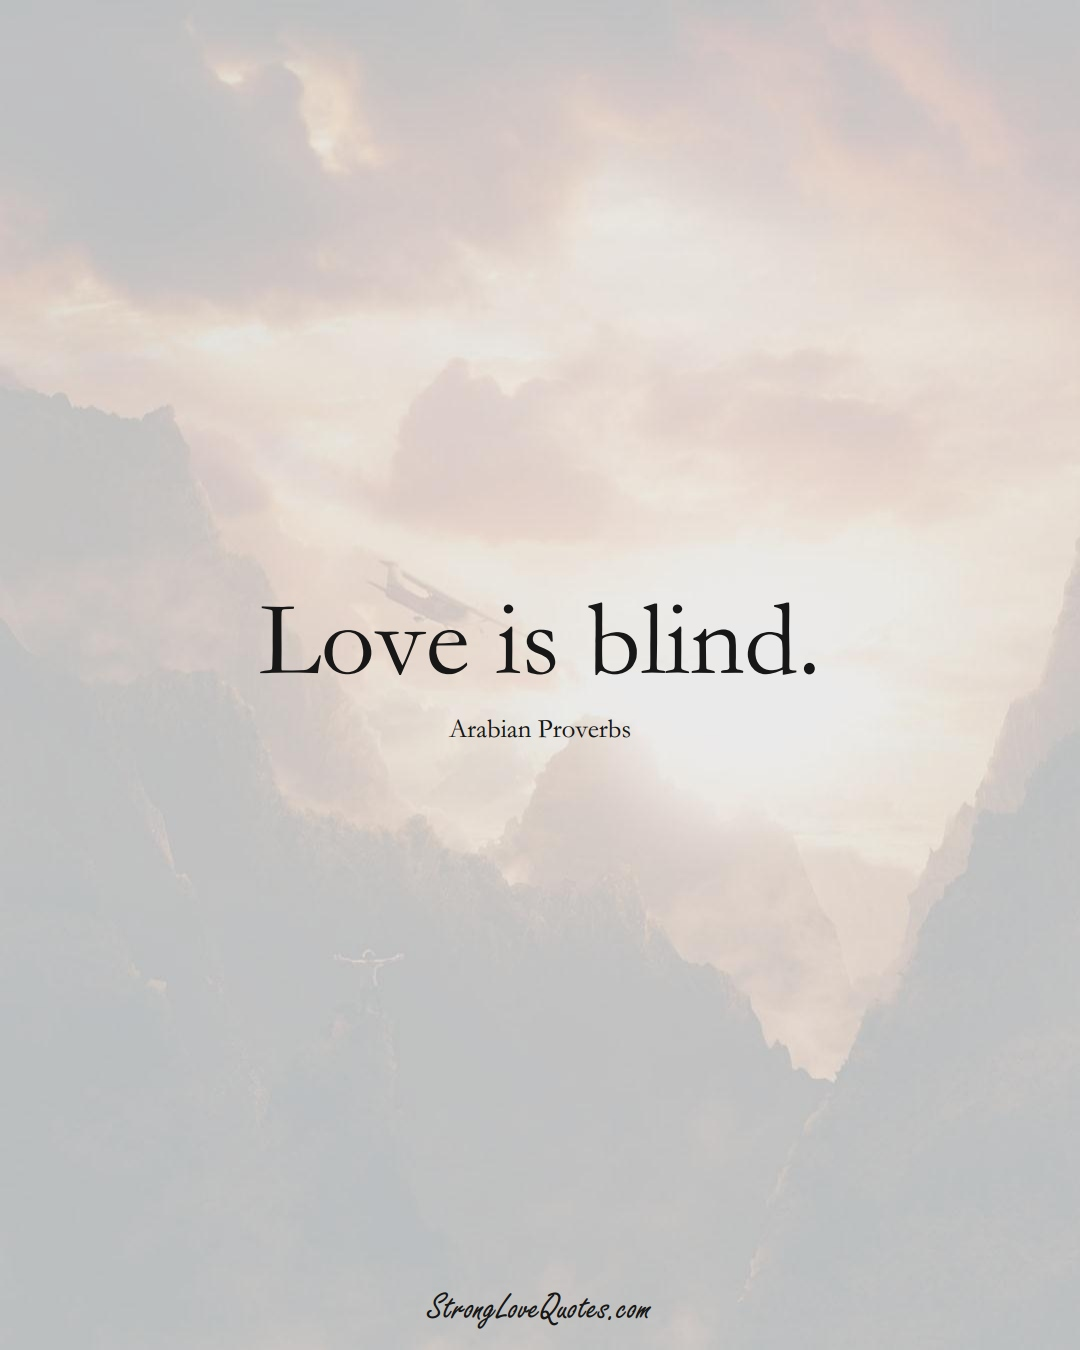 Love is blind. (Arabian Sayings);  #aVarietyofCulturesSayings